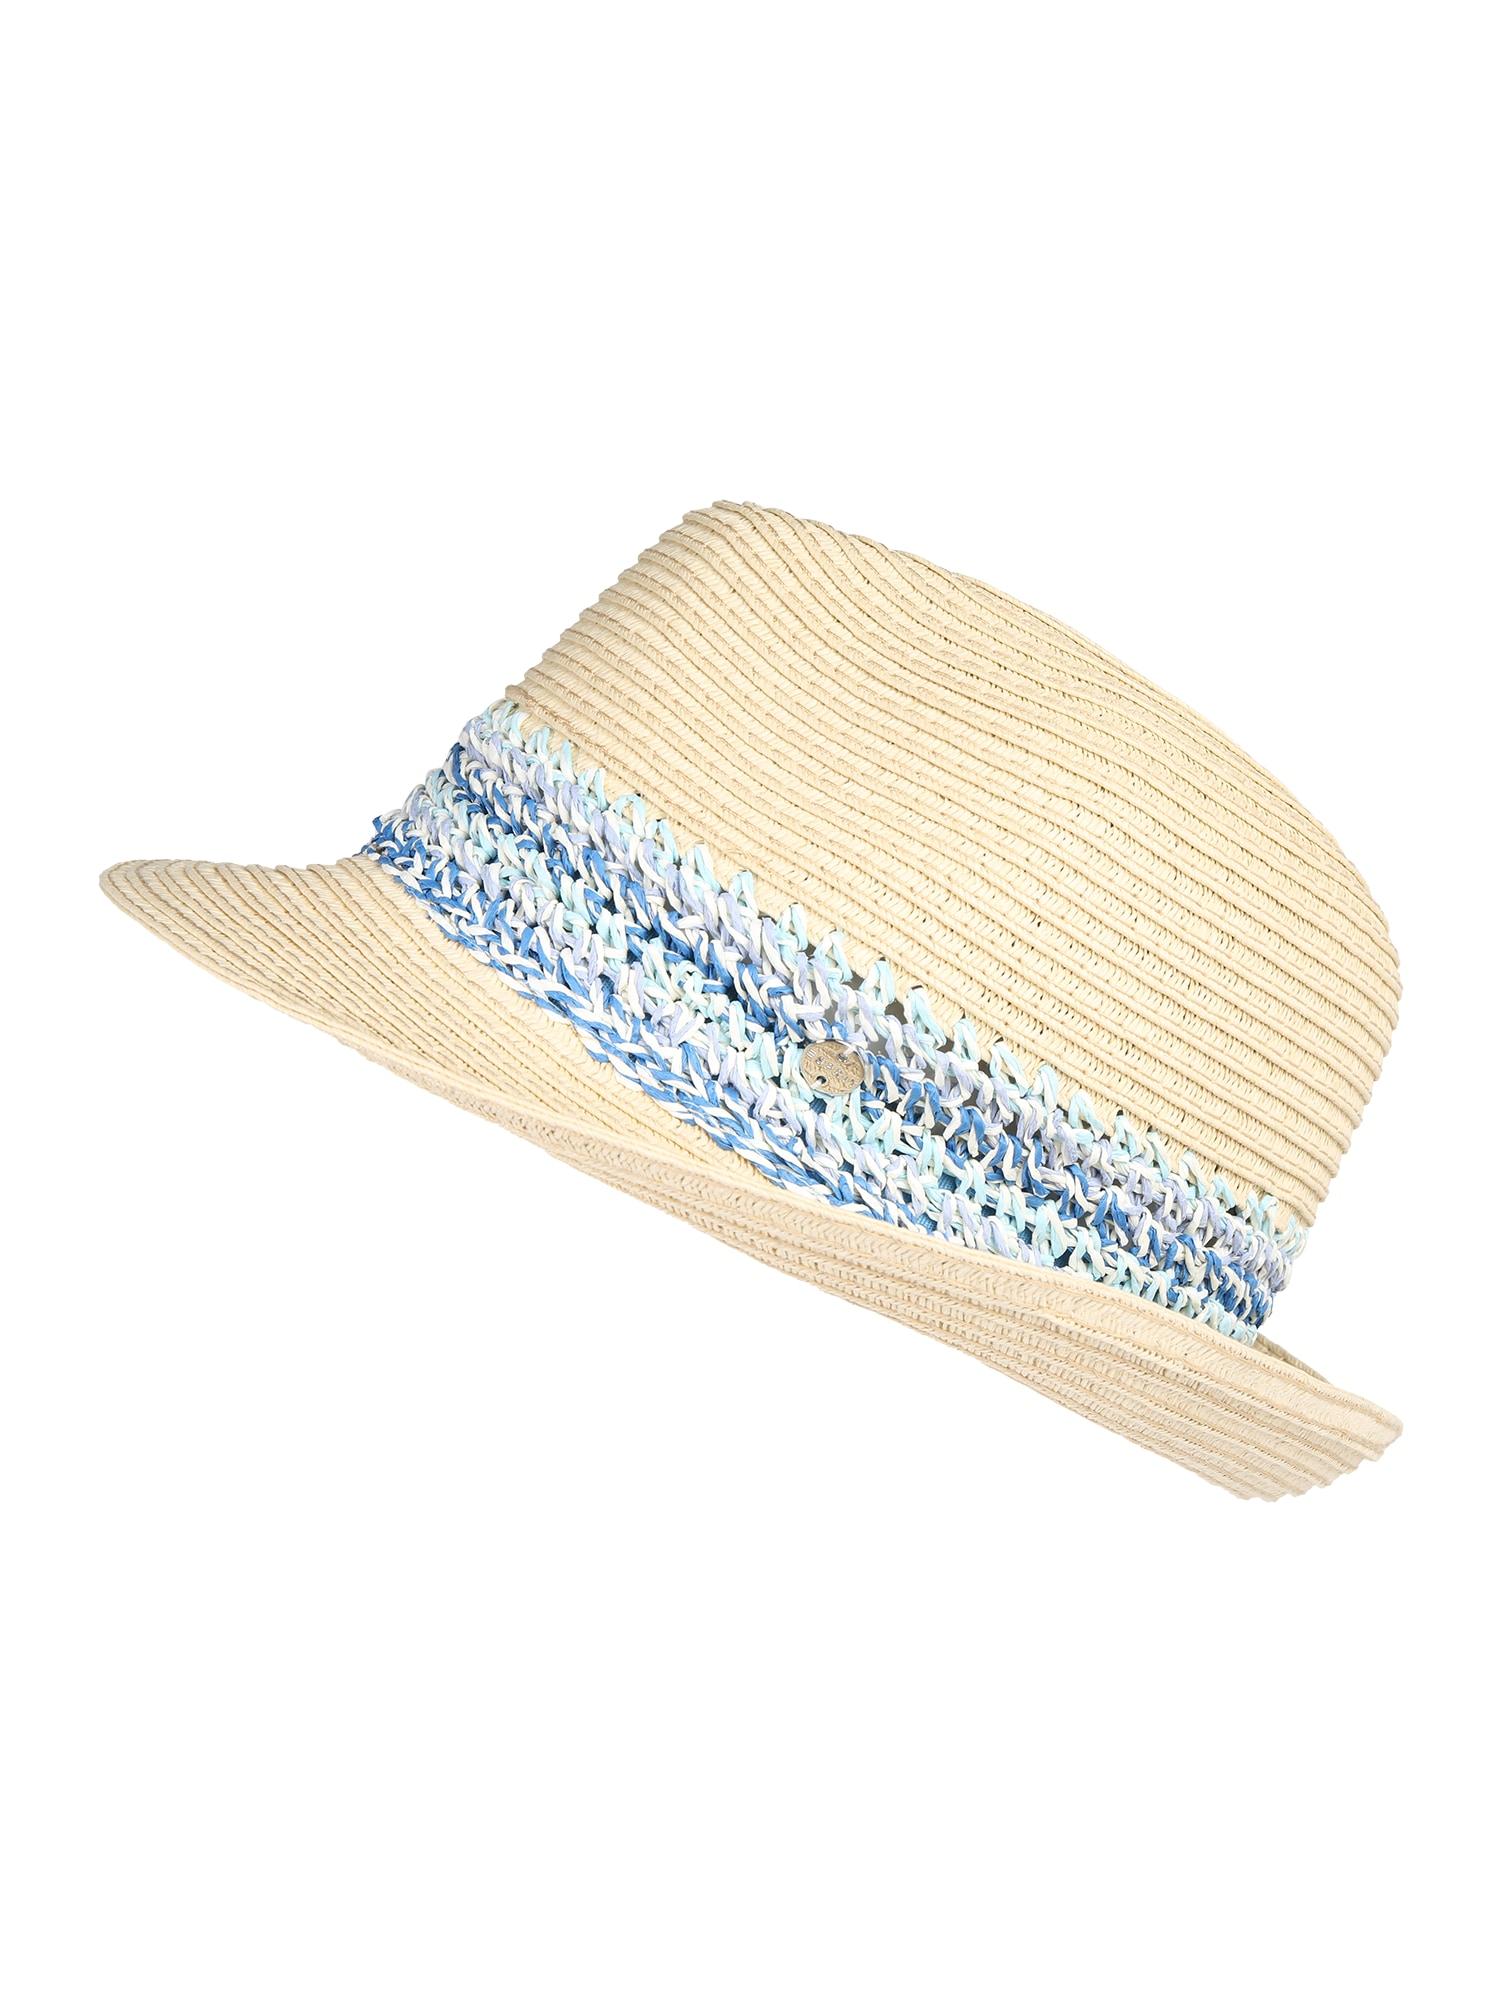 Klobouk CrochStrpTrillb beige blau ESPRIT